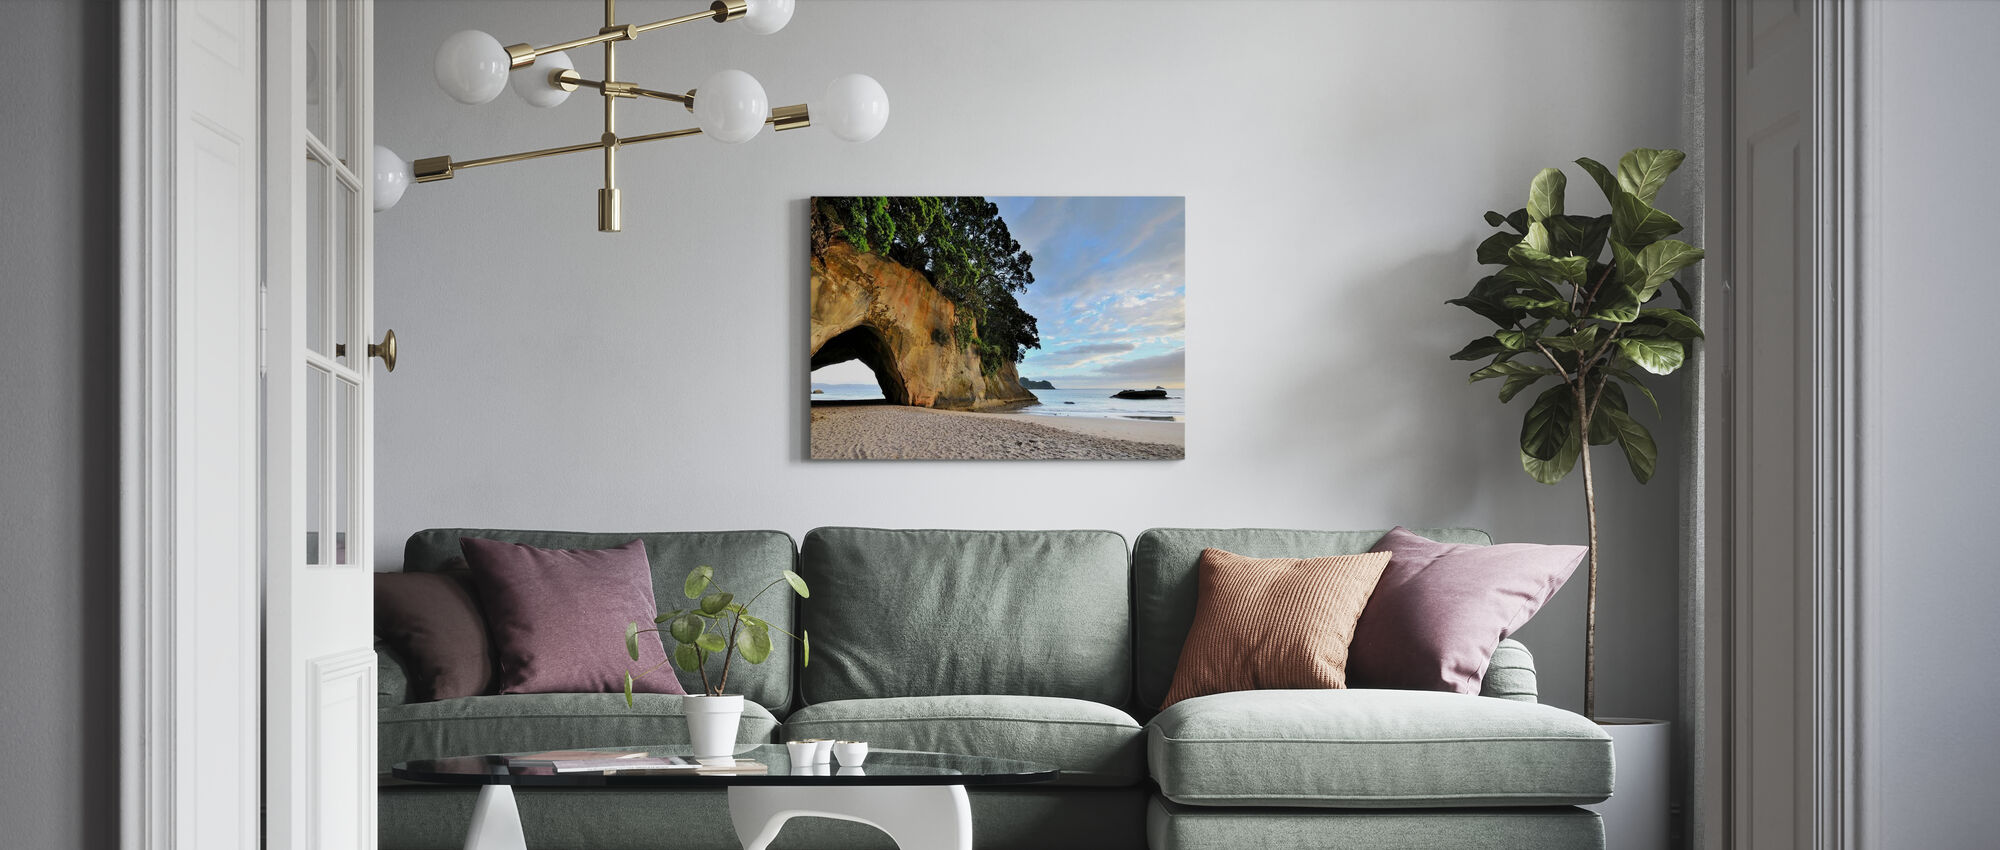 Rock Cave på stranden - Canvastavla - Vardagsrum